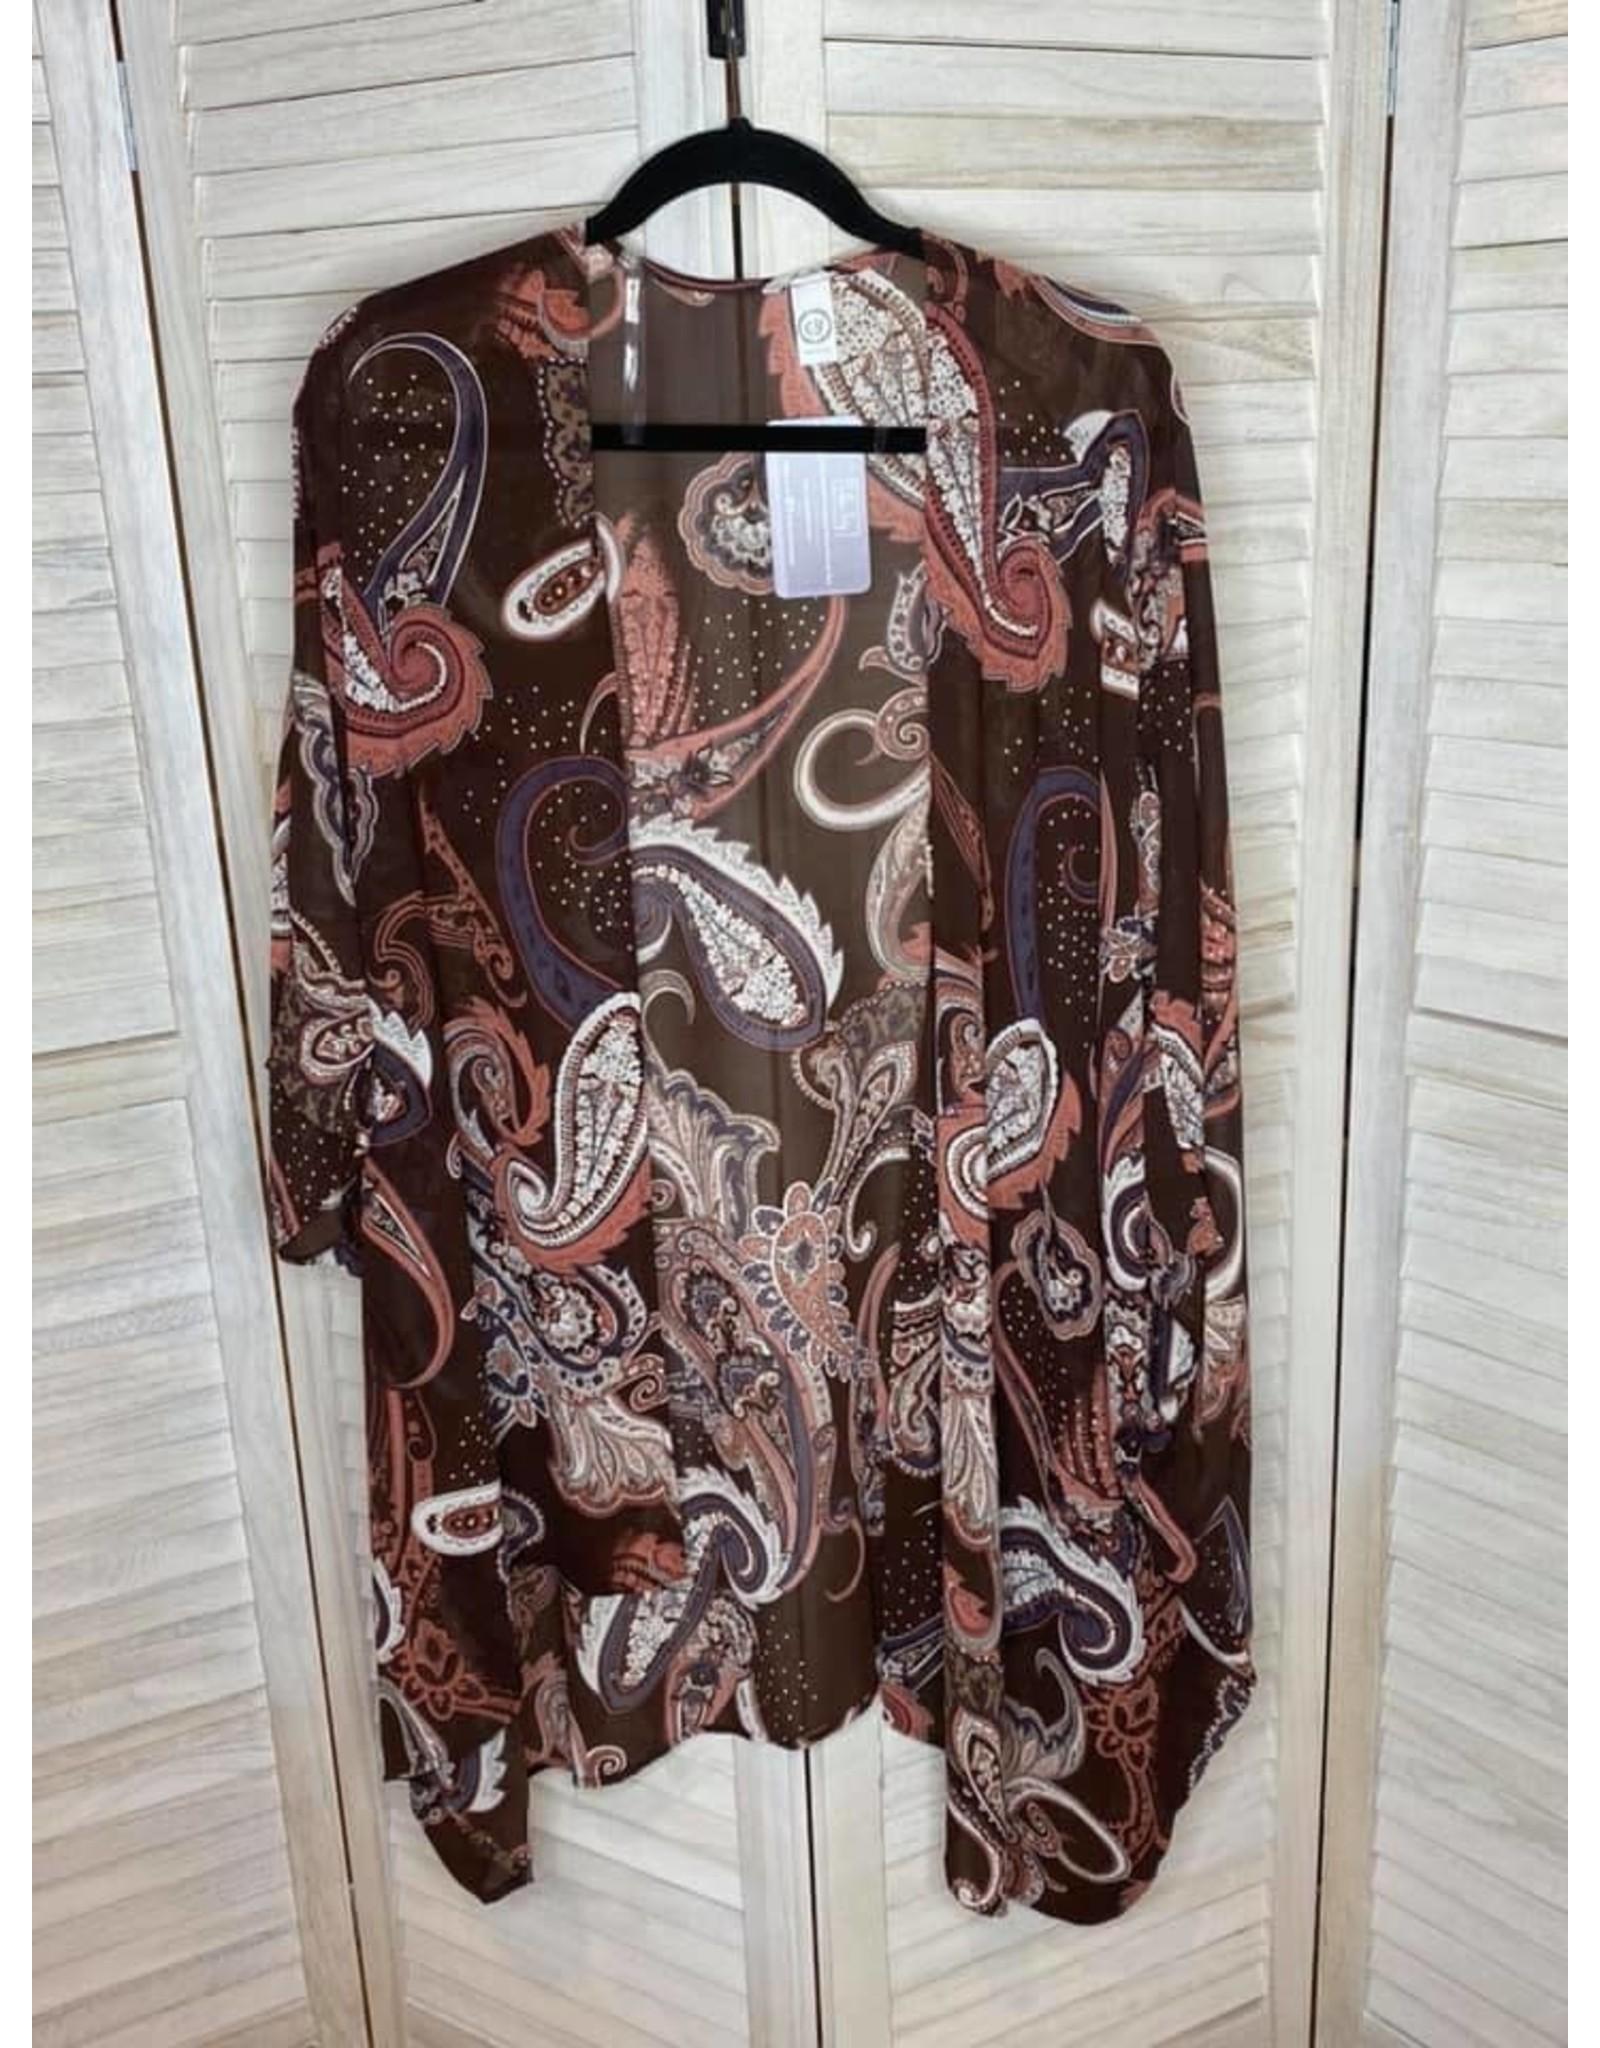 CY Fashion Oversized Rosy Brown Floral Kimono - Plus